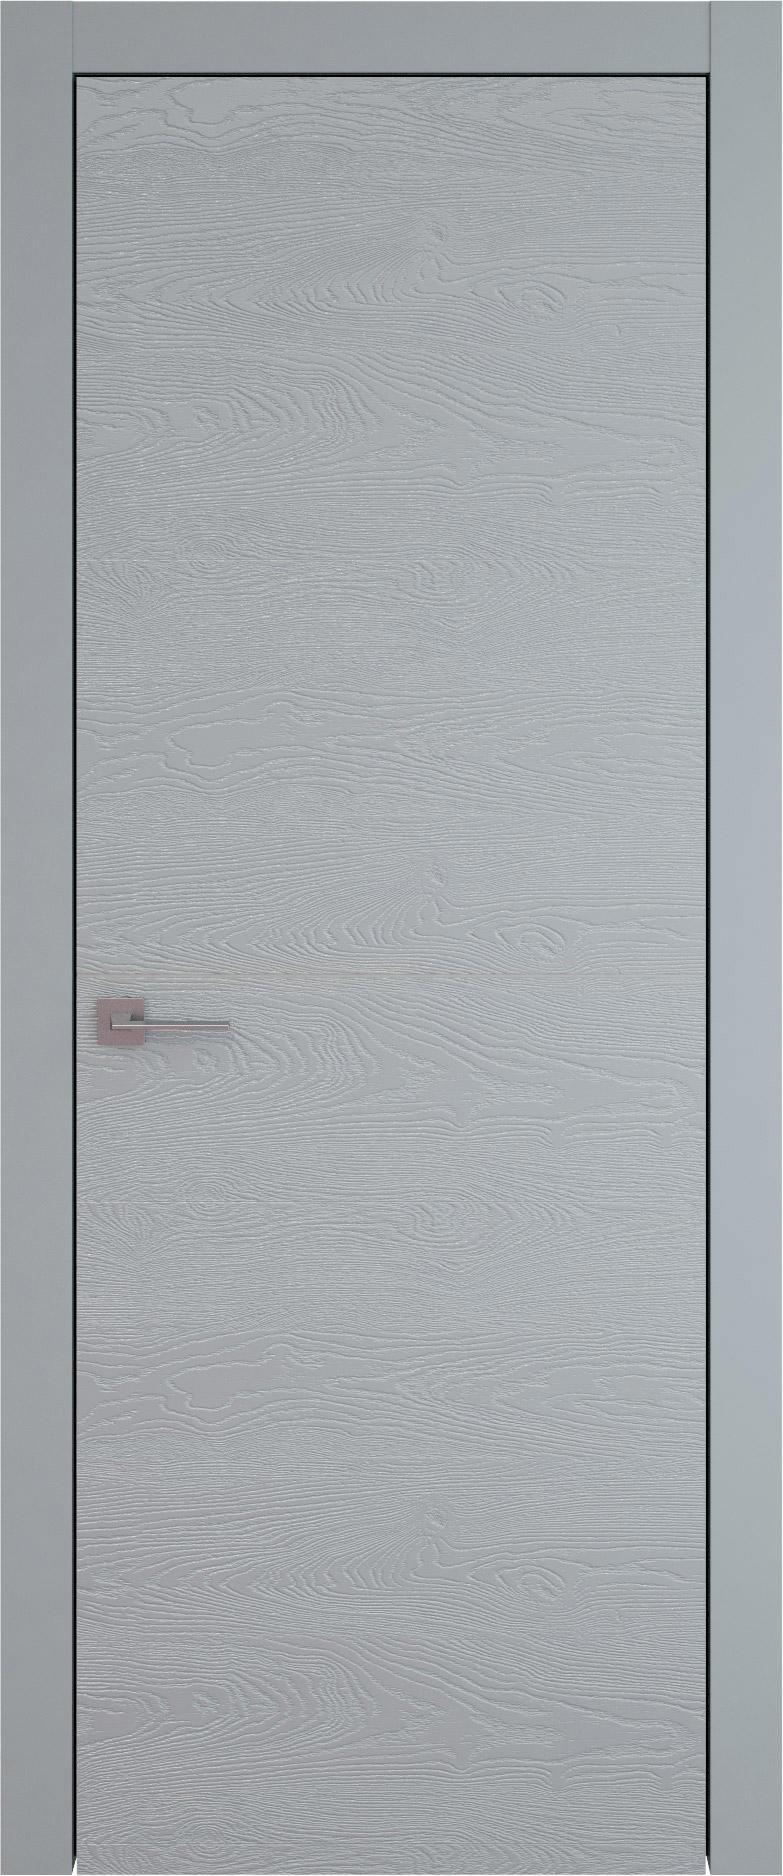 Tivoli Б-2 цвет - Серебристо-серая эмаль по шпону (RAL 7045) Без стекла (ДГ)